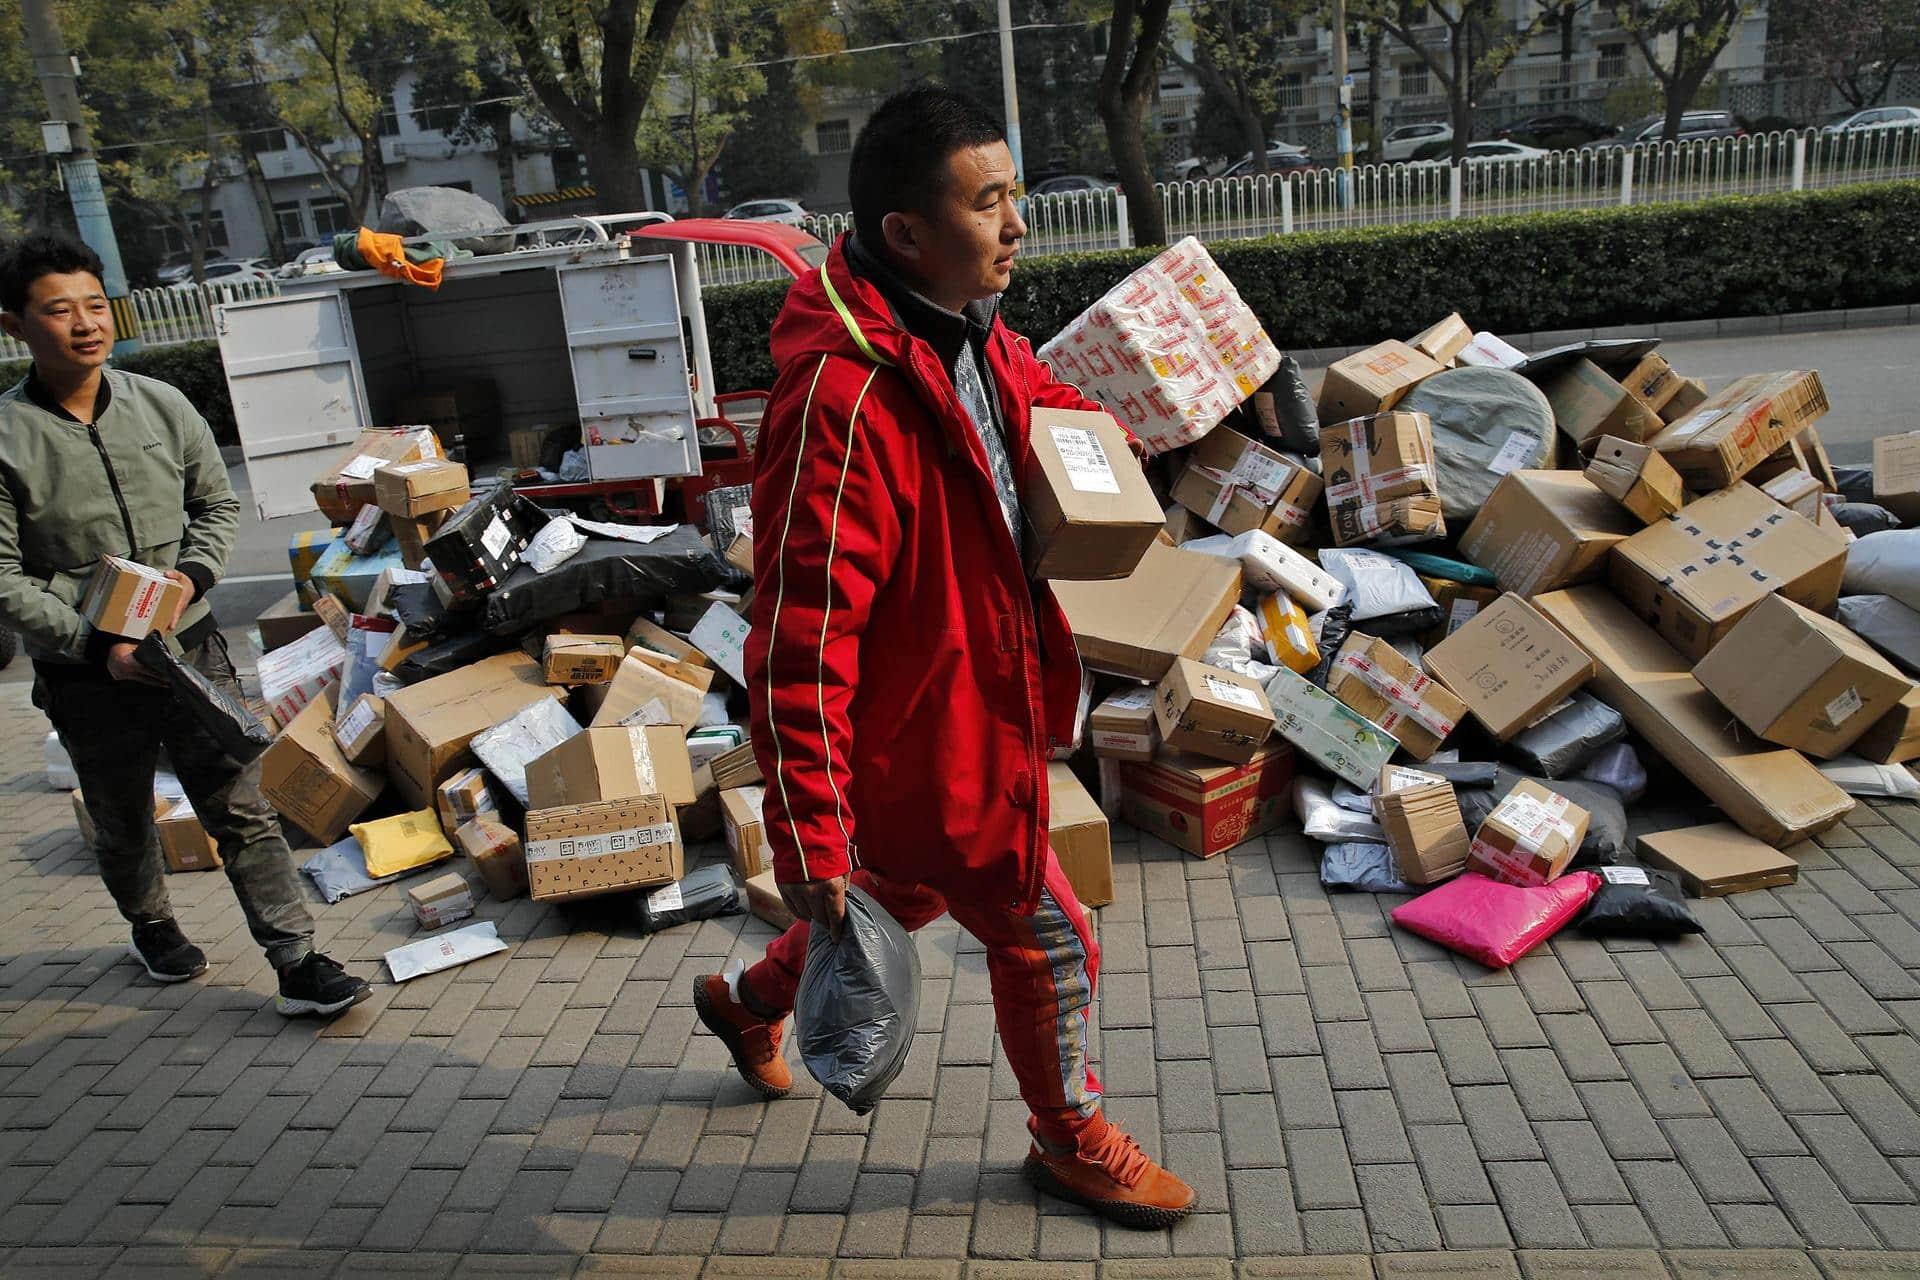 Alibaba: Verkaufsrekord bei weltgrößter Rabattschlacht «Singles Day» in China